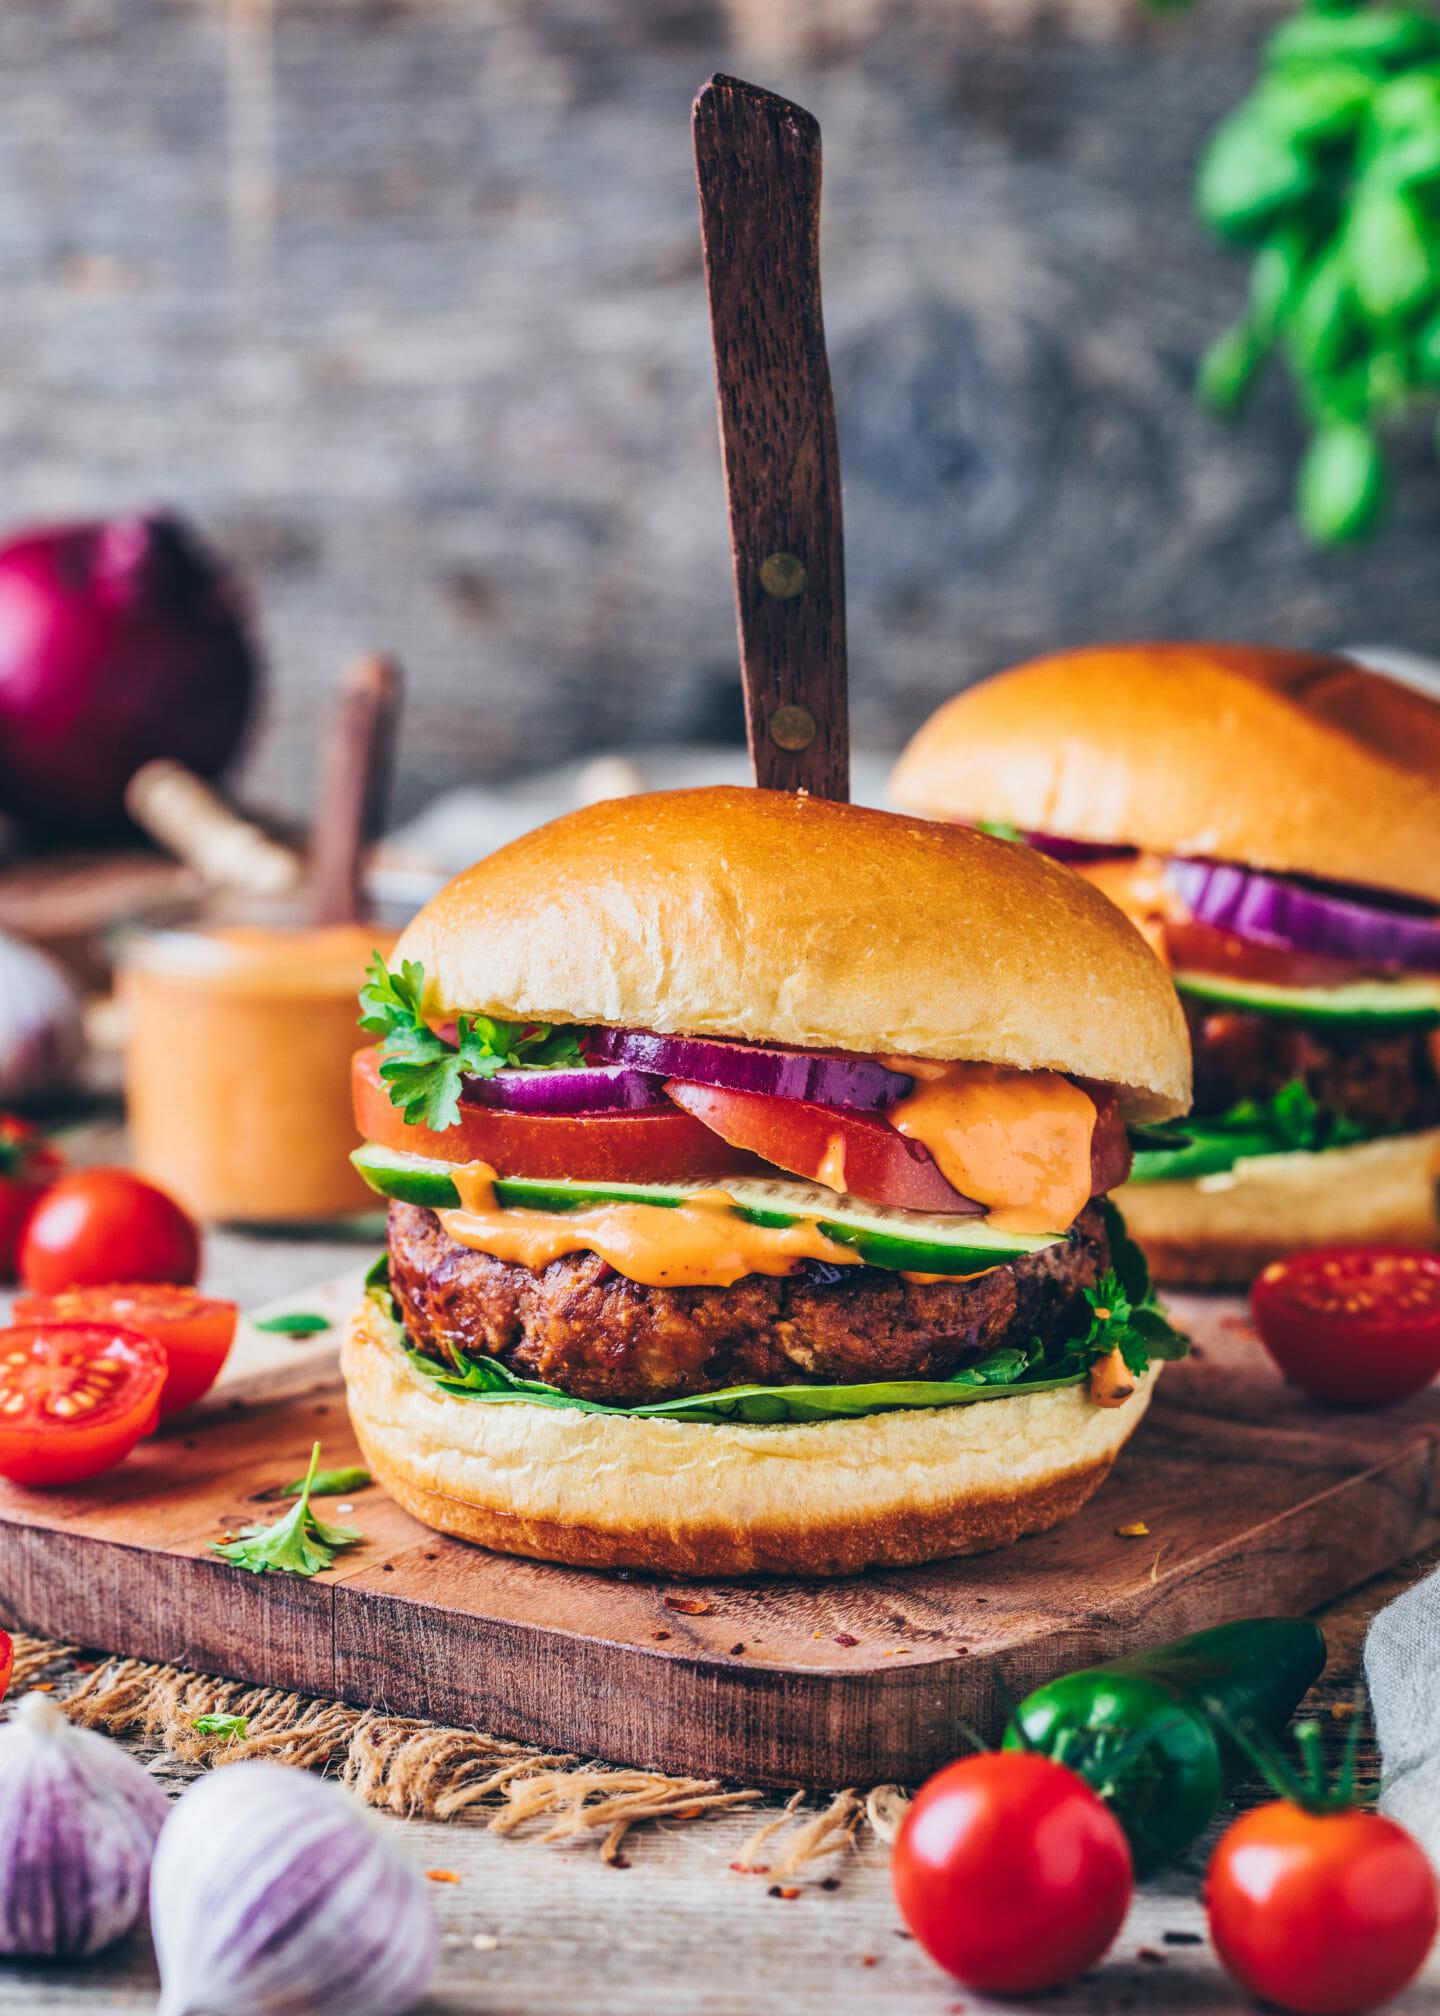 The Best Vegan Burger Recipe Easy Gluten Free Bianca Zapatka Recipes